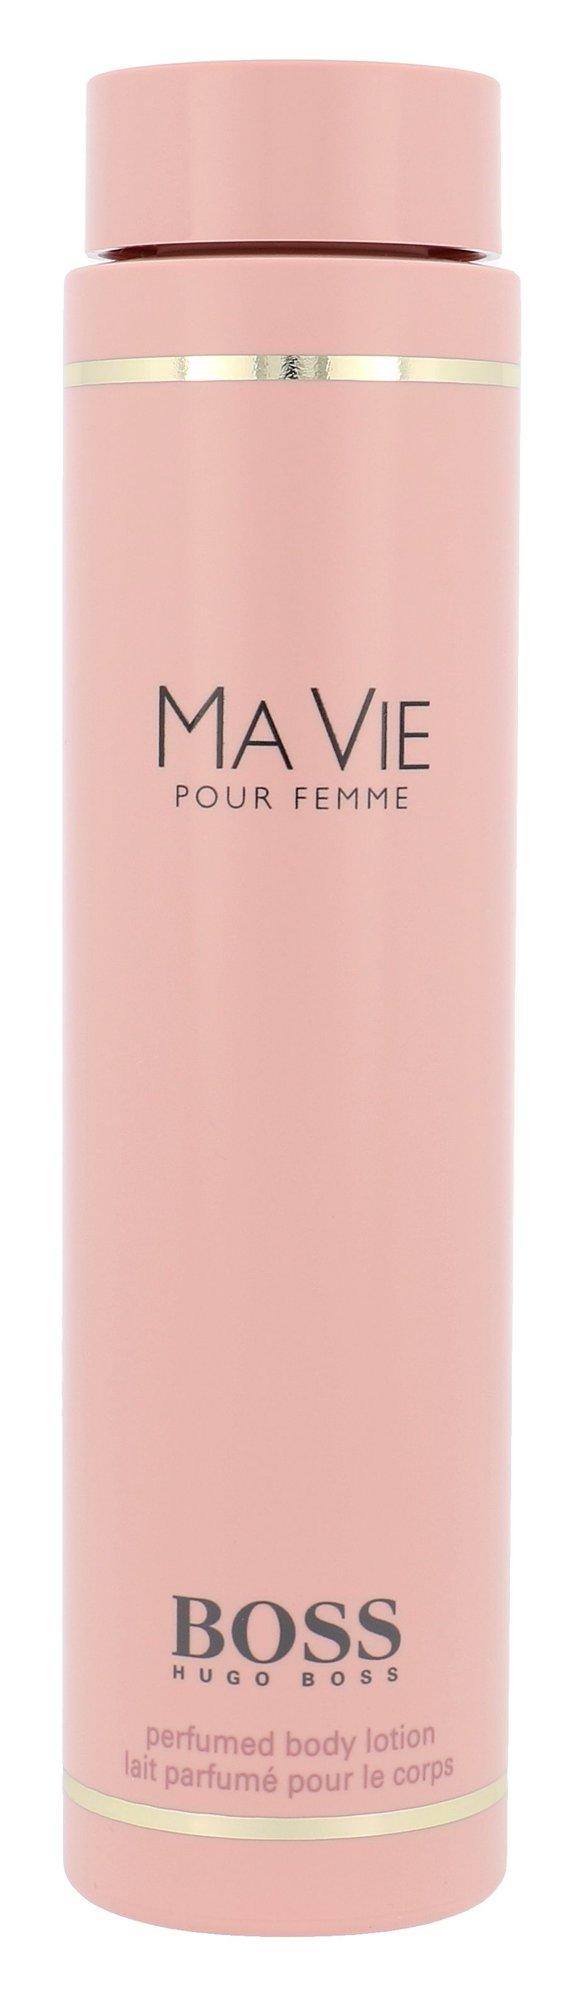 HUGO BOSS Boss Ma Vie Pour Femme, Tělové mléko 200ml